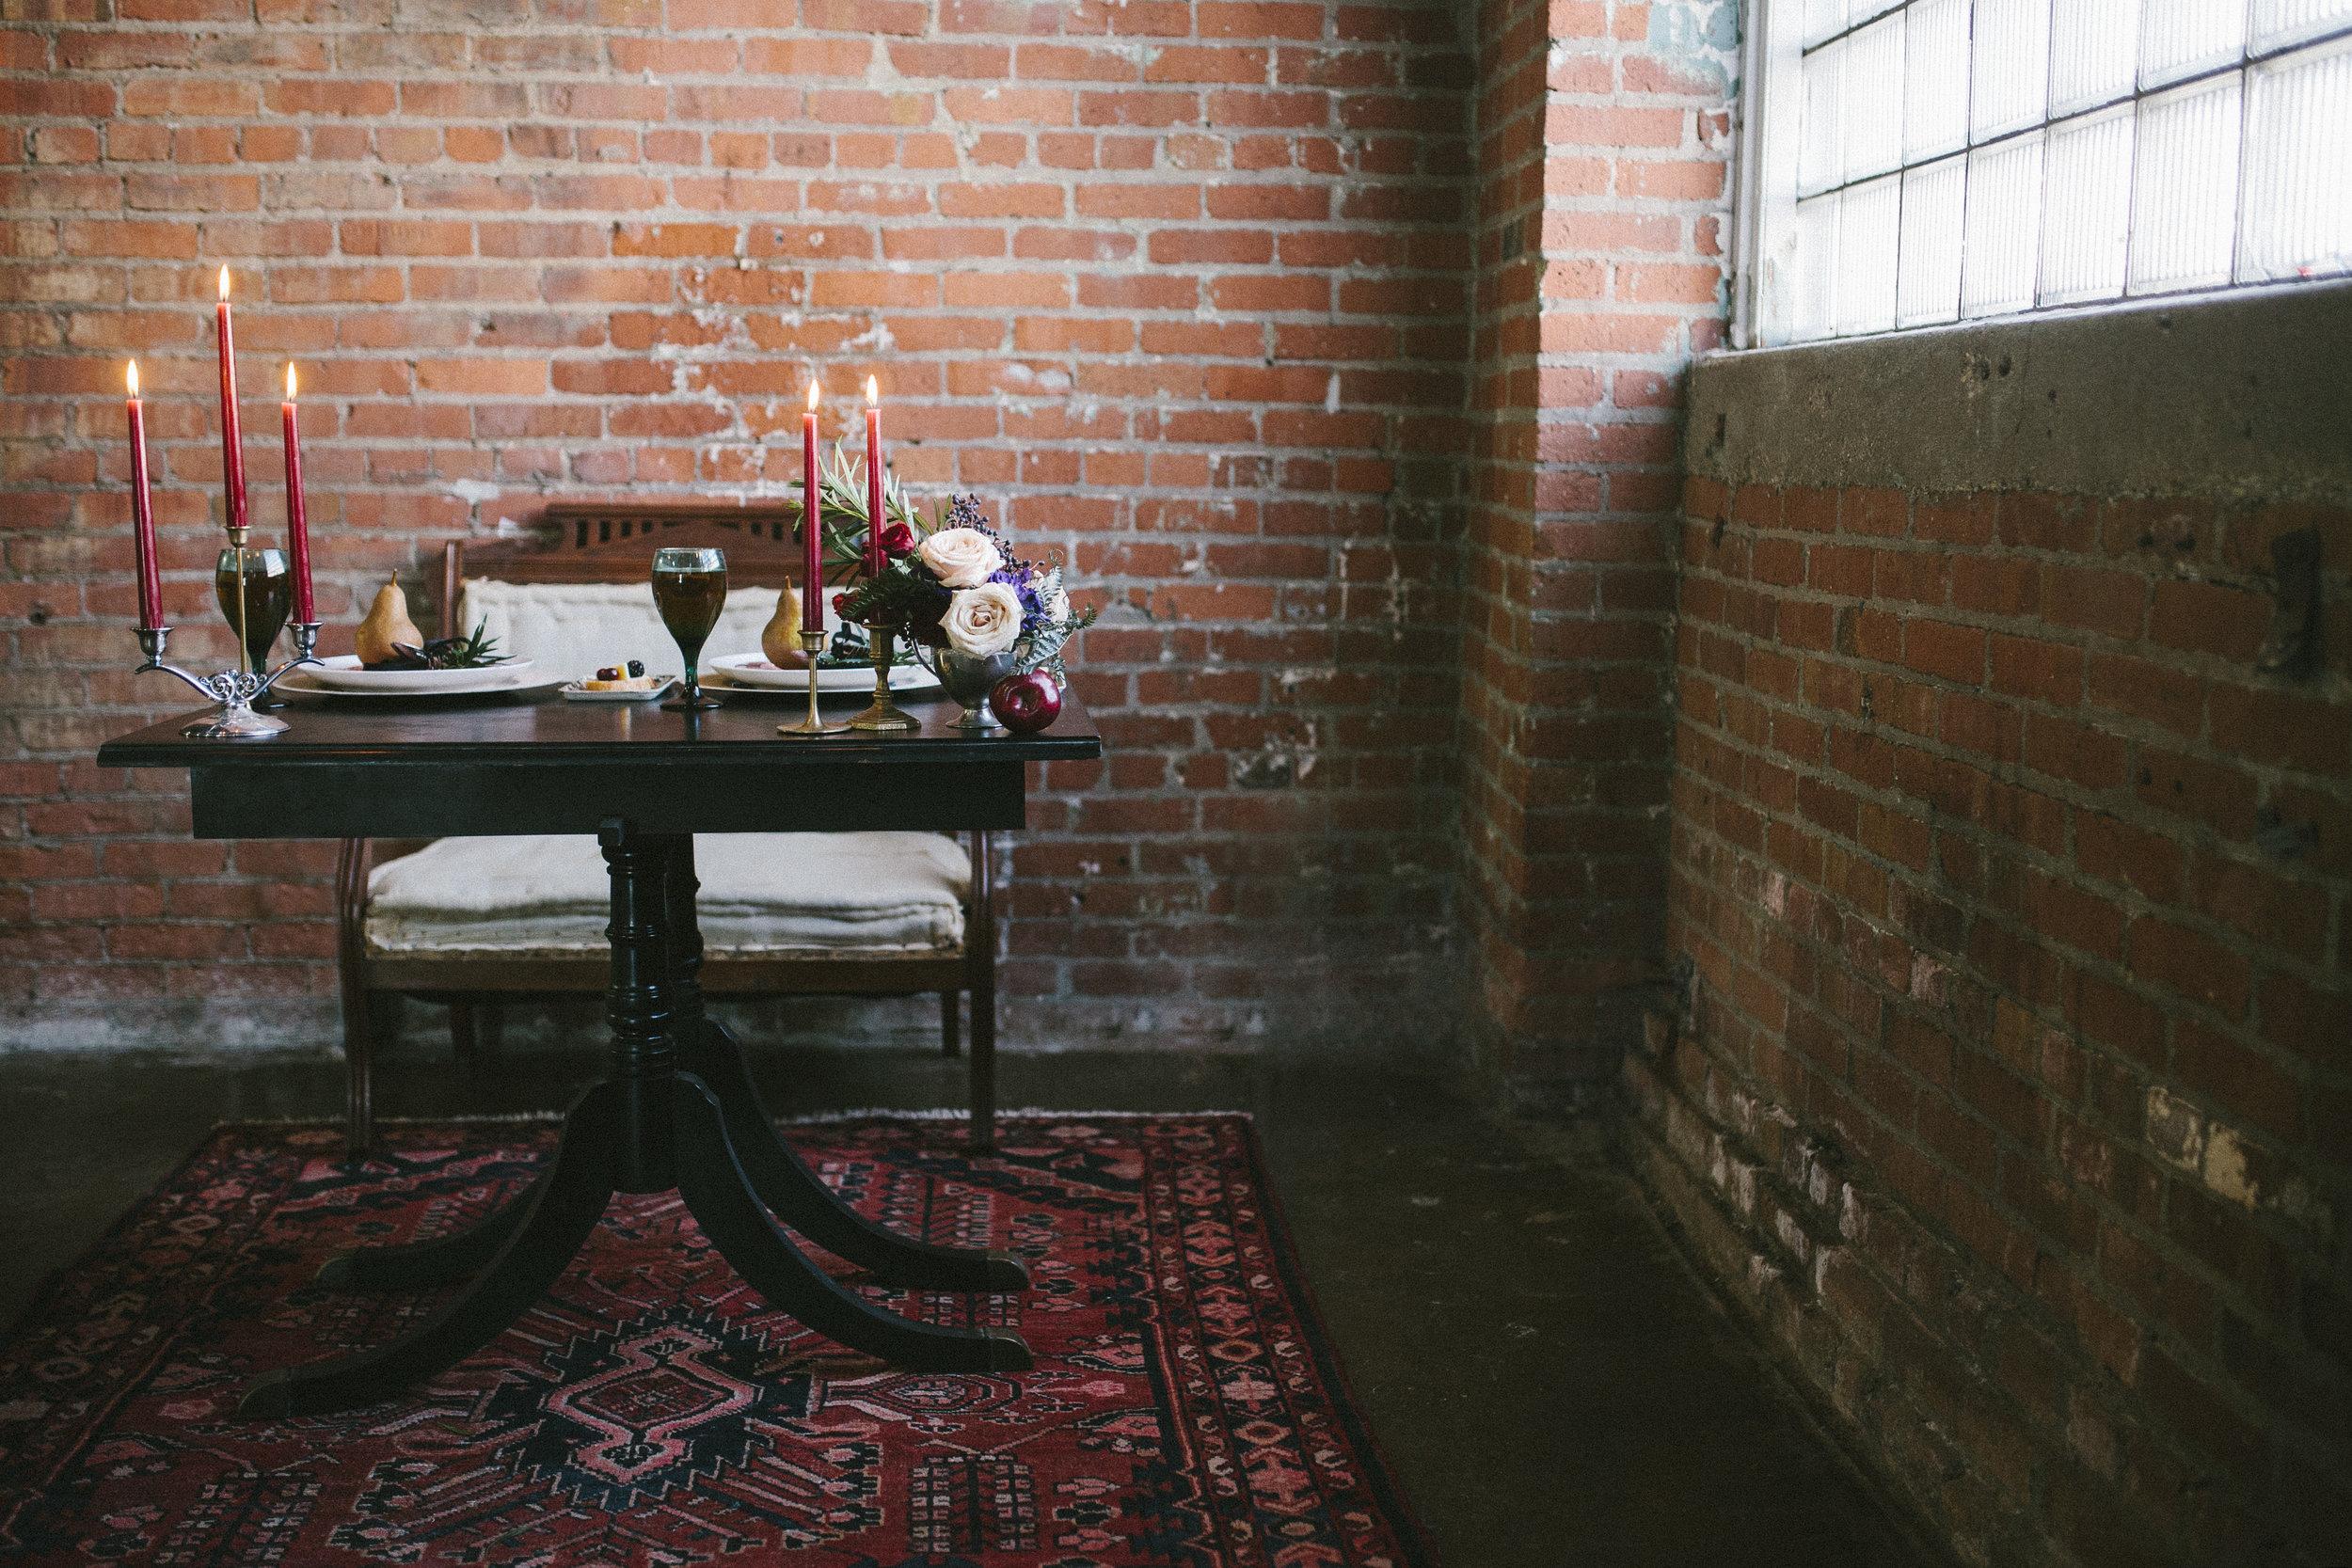 Spruce Rentals - Something Old Event Rentals - Made to be Mine - Splendor of Eden - Heirloom Chicago